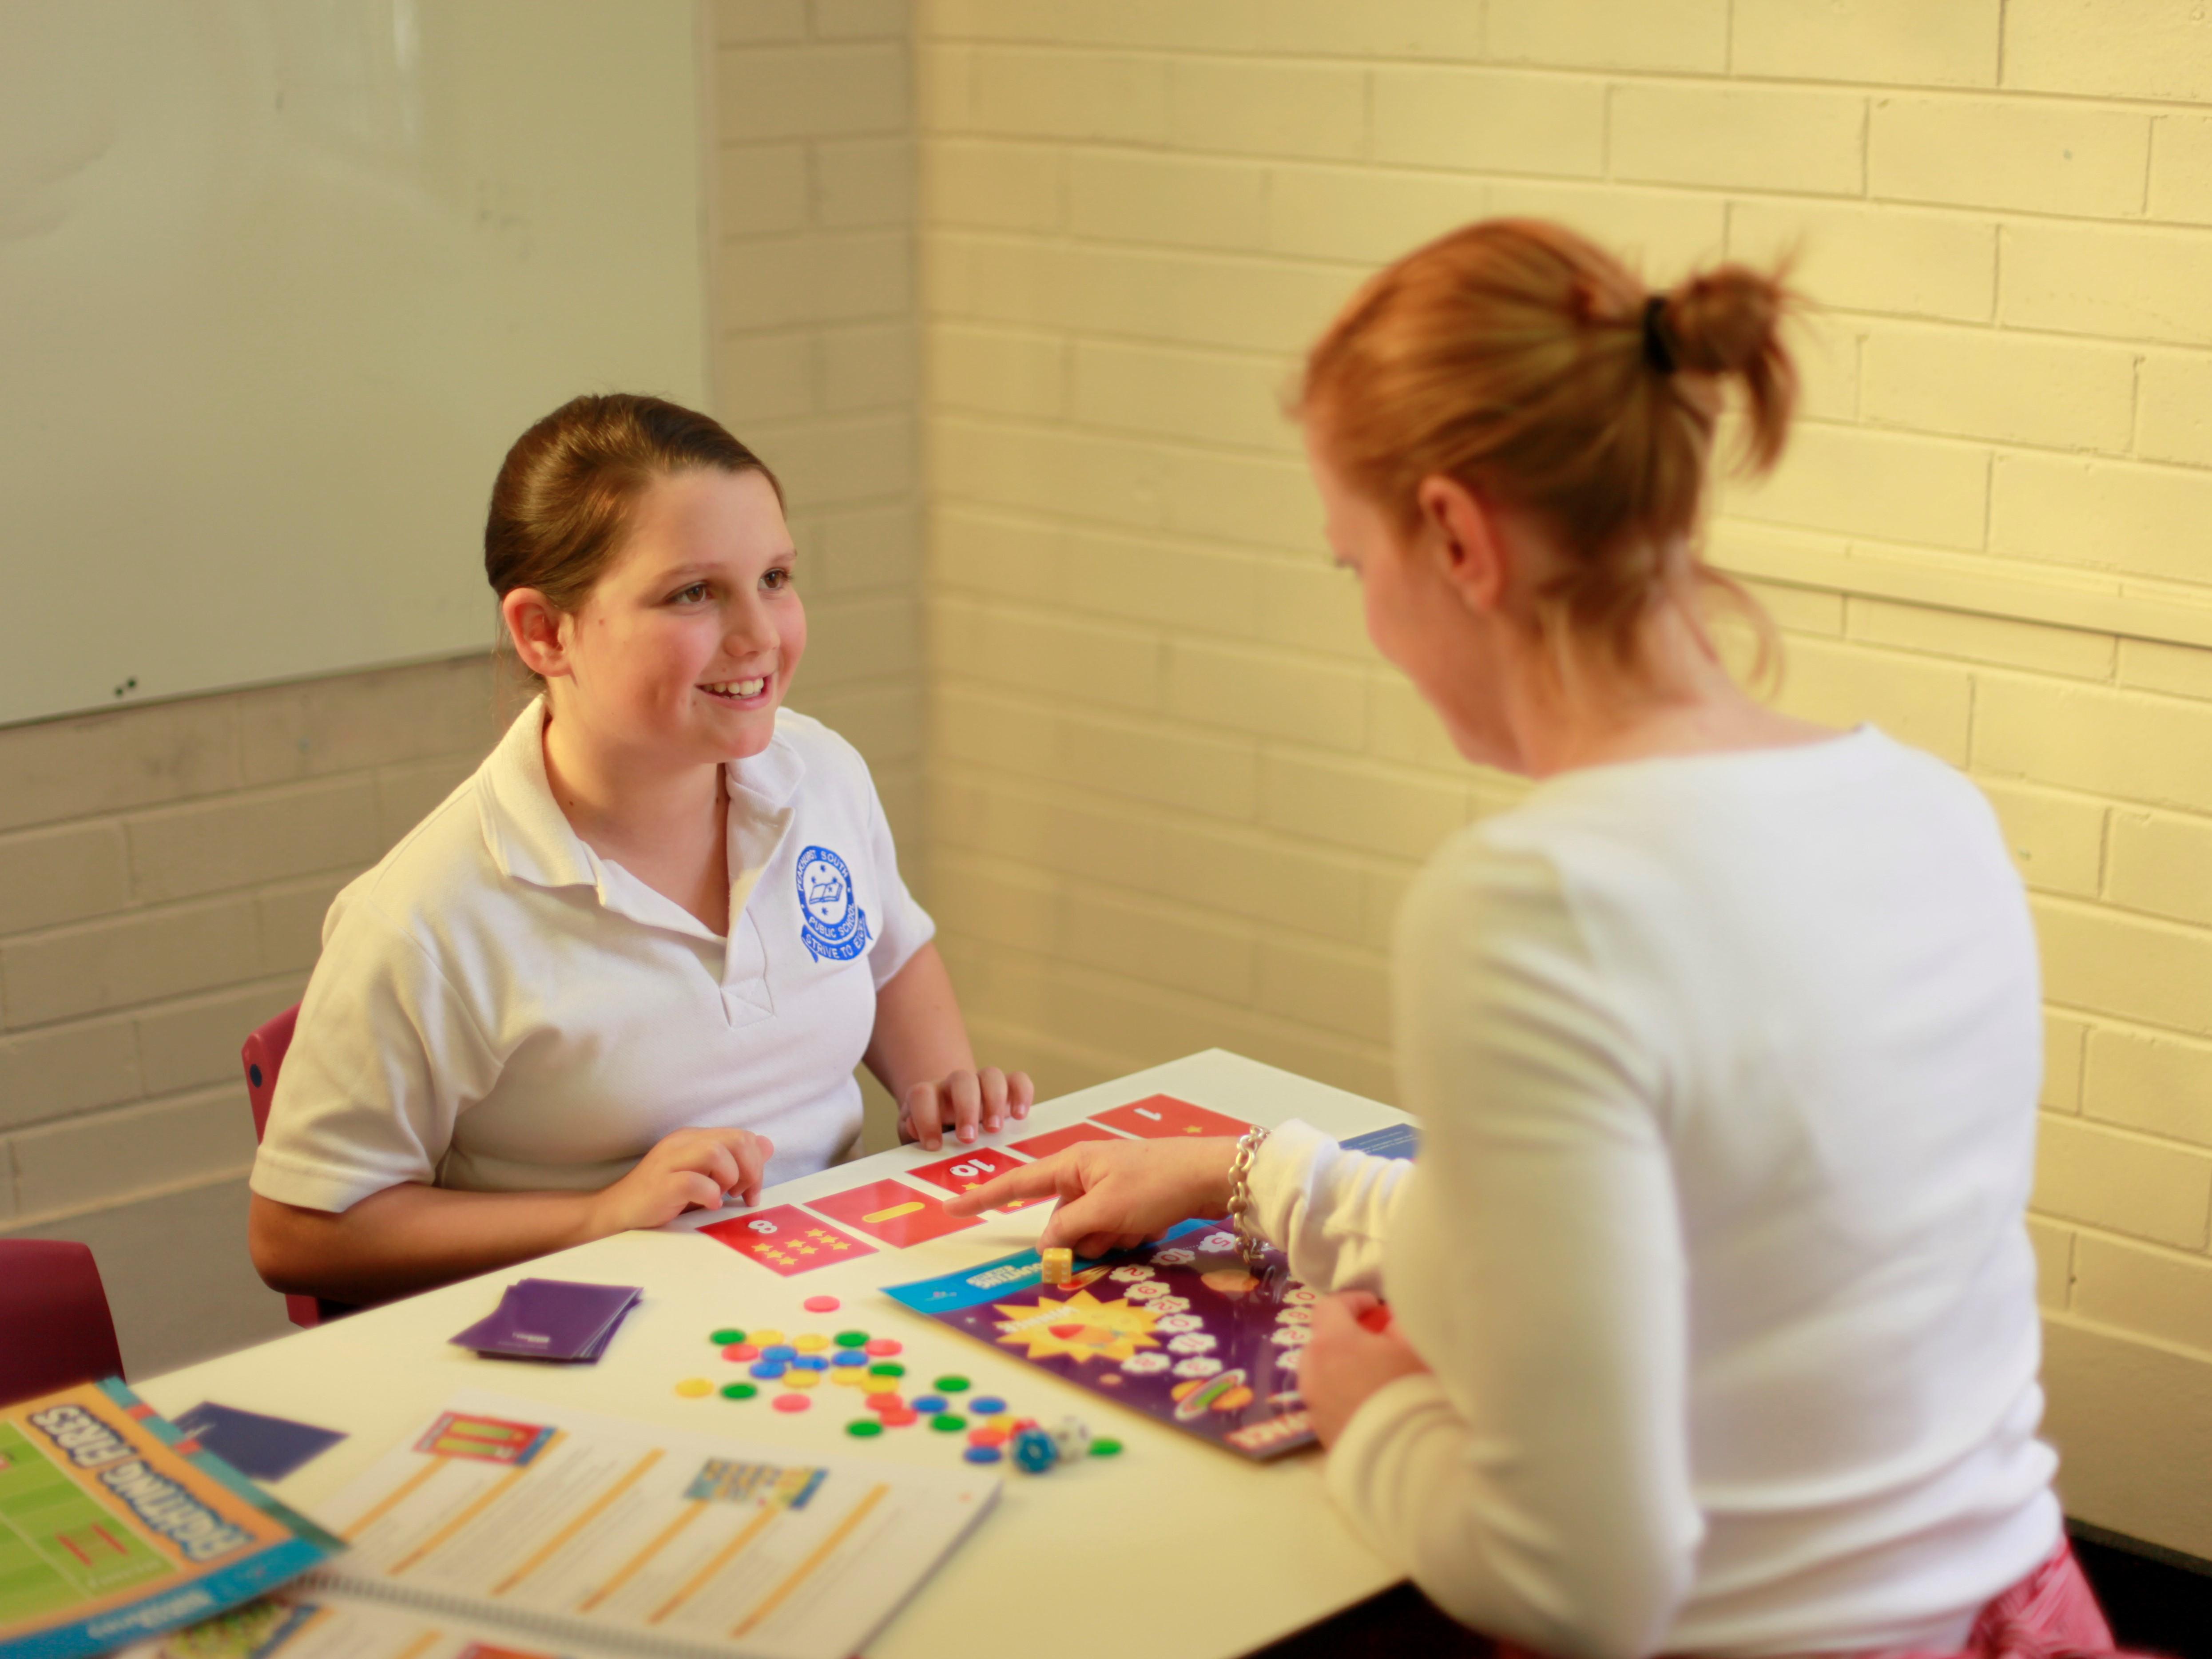 Sydney Women's Fund, Sydney Youth Charity, Be Kind Sydney, Sydney Community Foundation, Learning Links